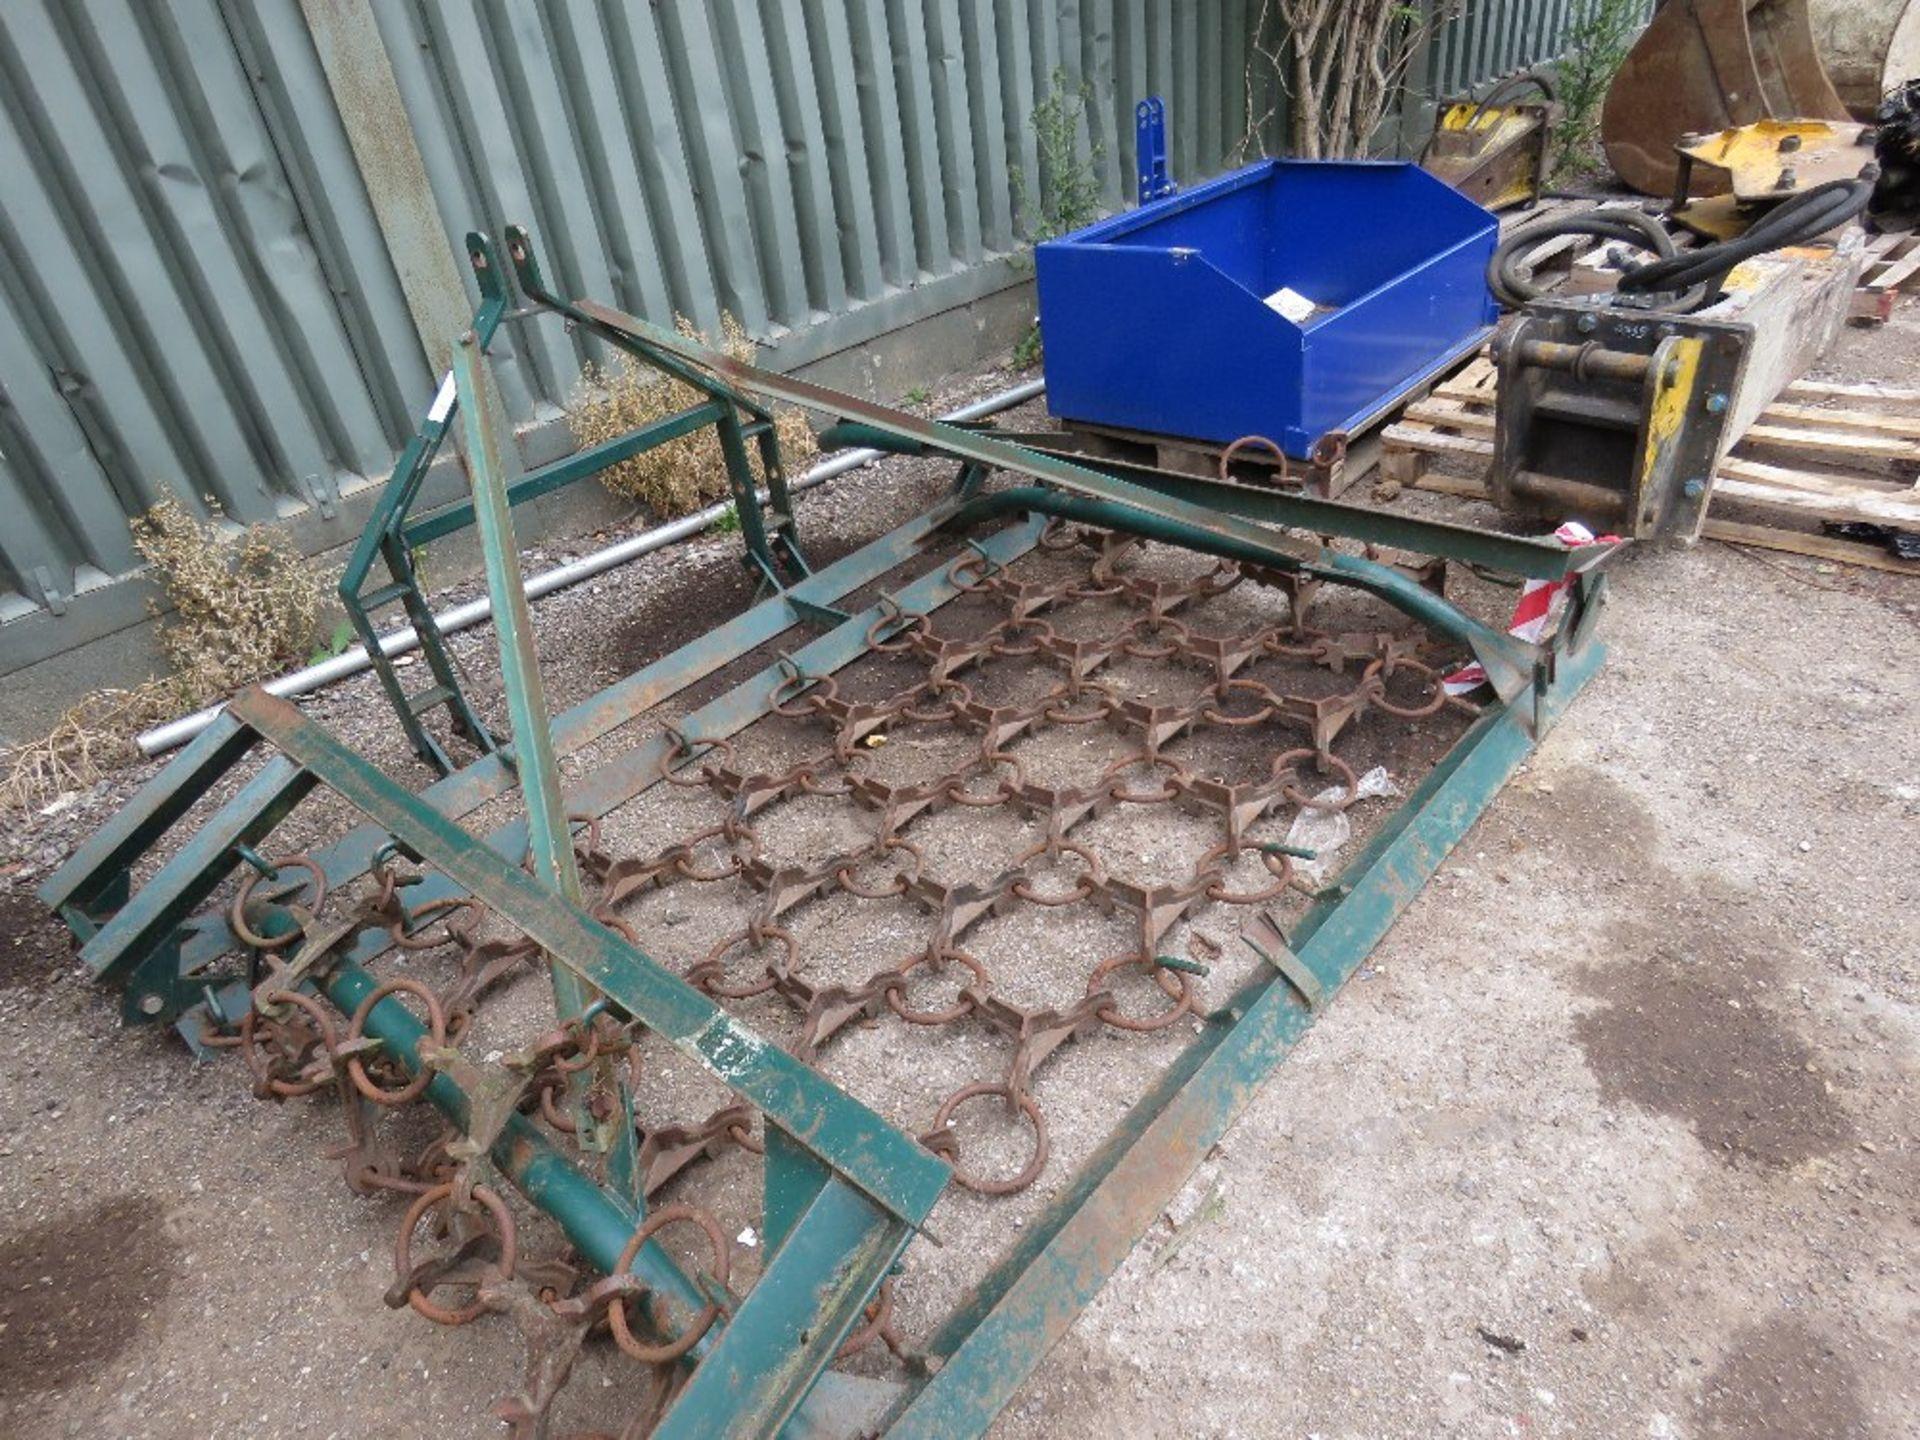 Lot 26 - Tractor mounted folding grass harrows